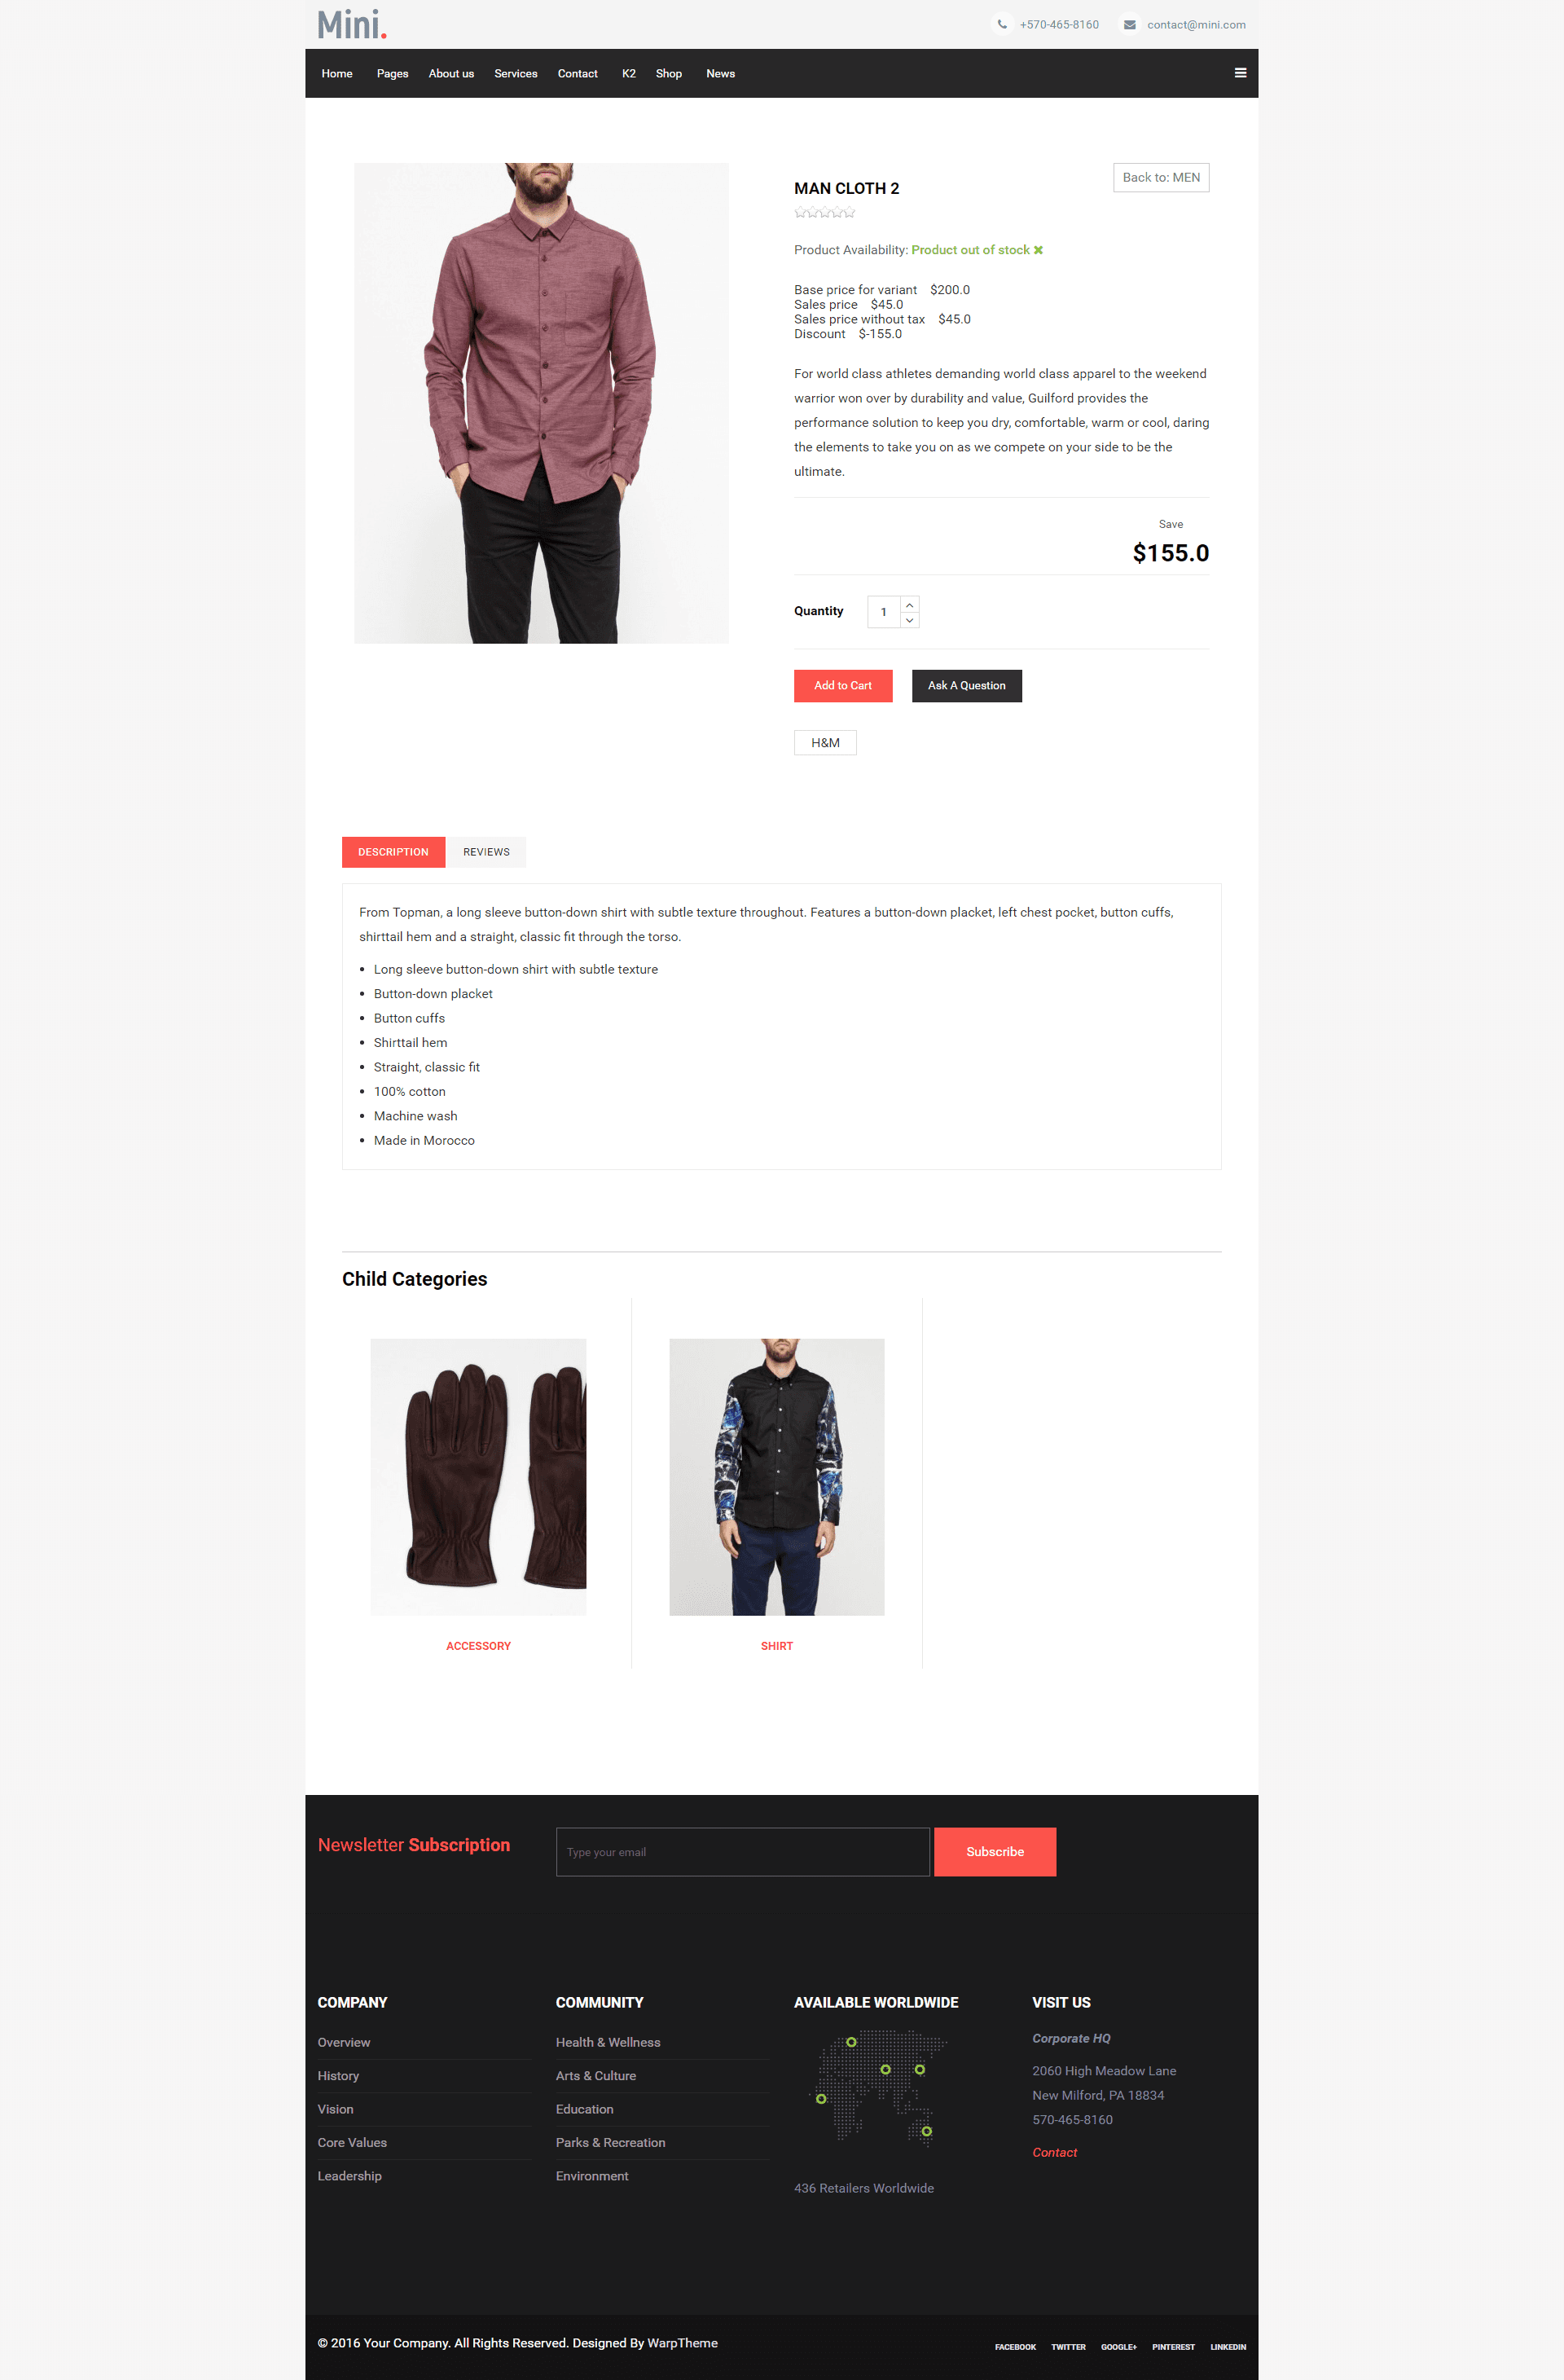 Mini Product Details